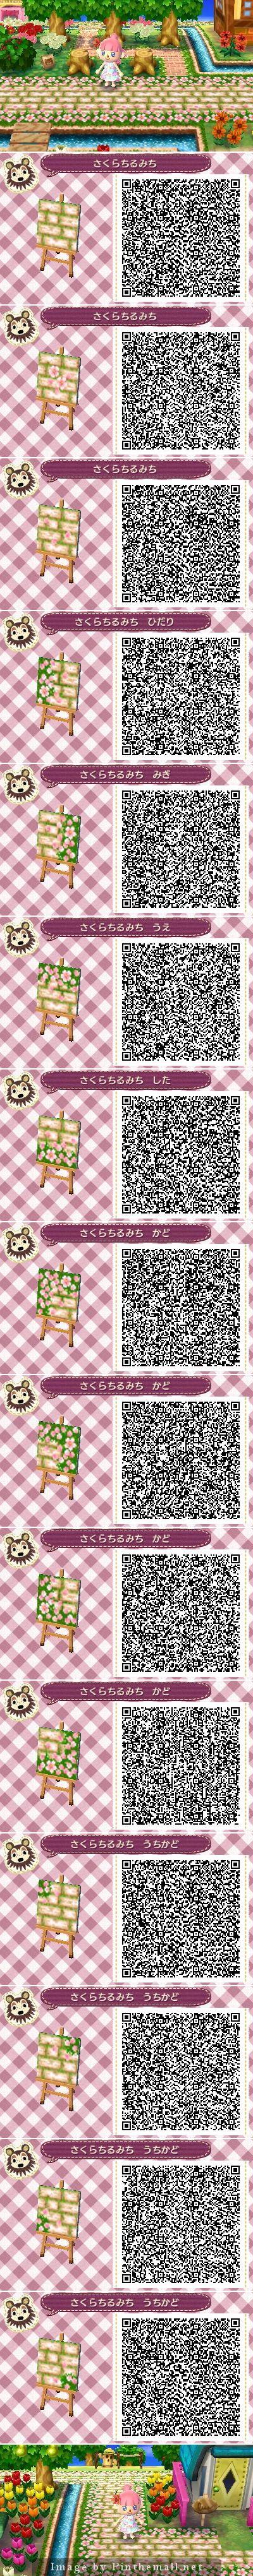 Sakura Blossom Pathway QR code